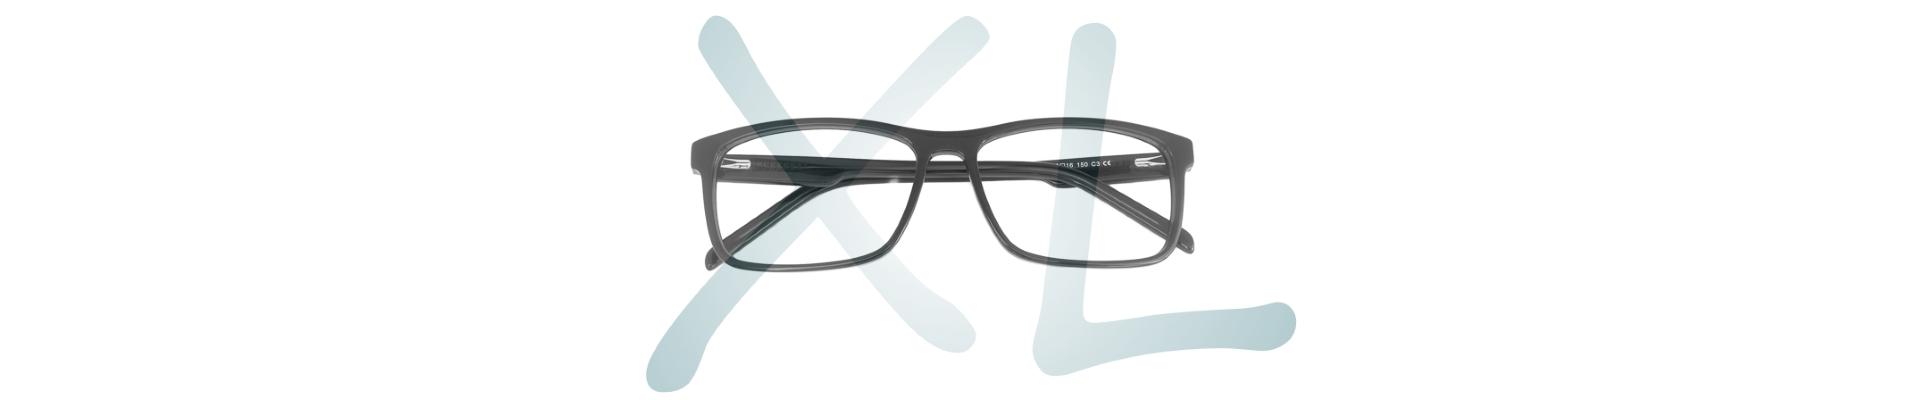 Glasses big size big measures eyewear sunglasses eyeglasses